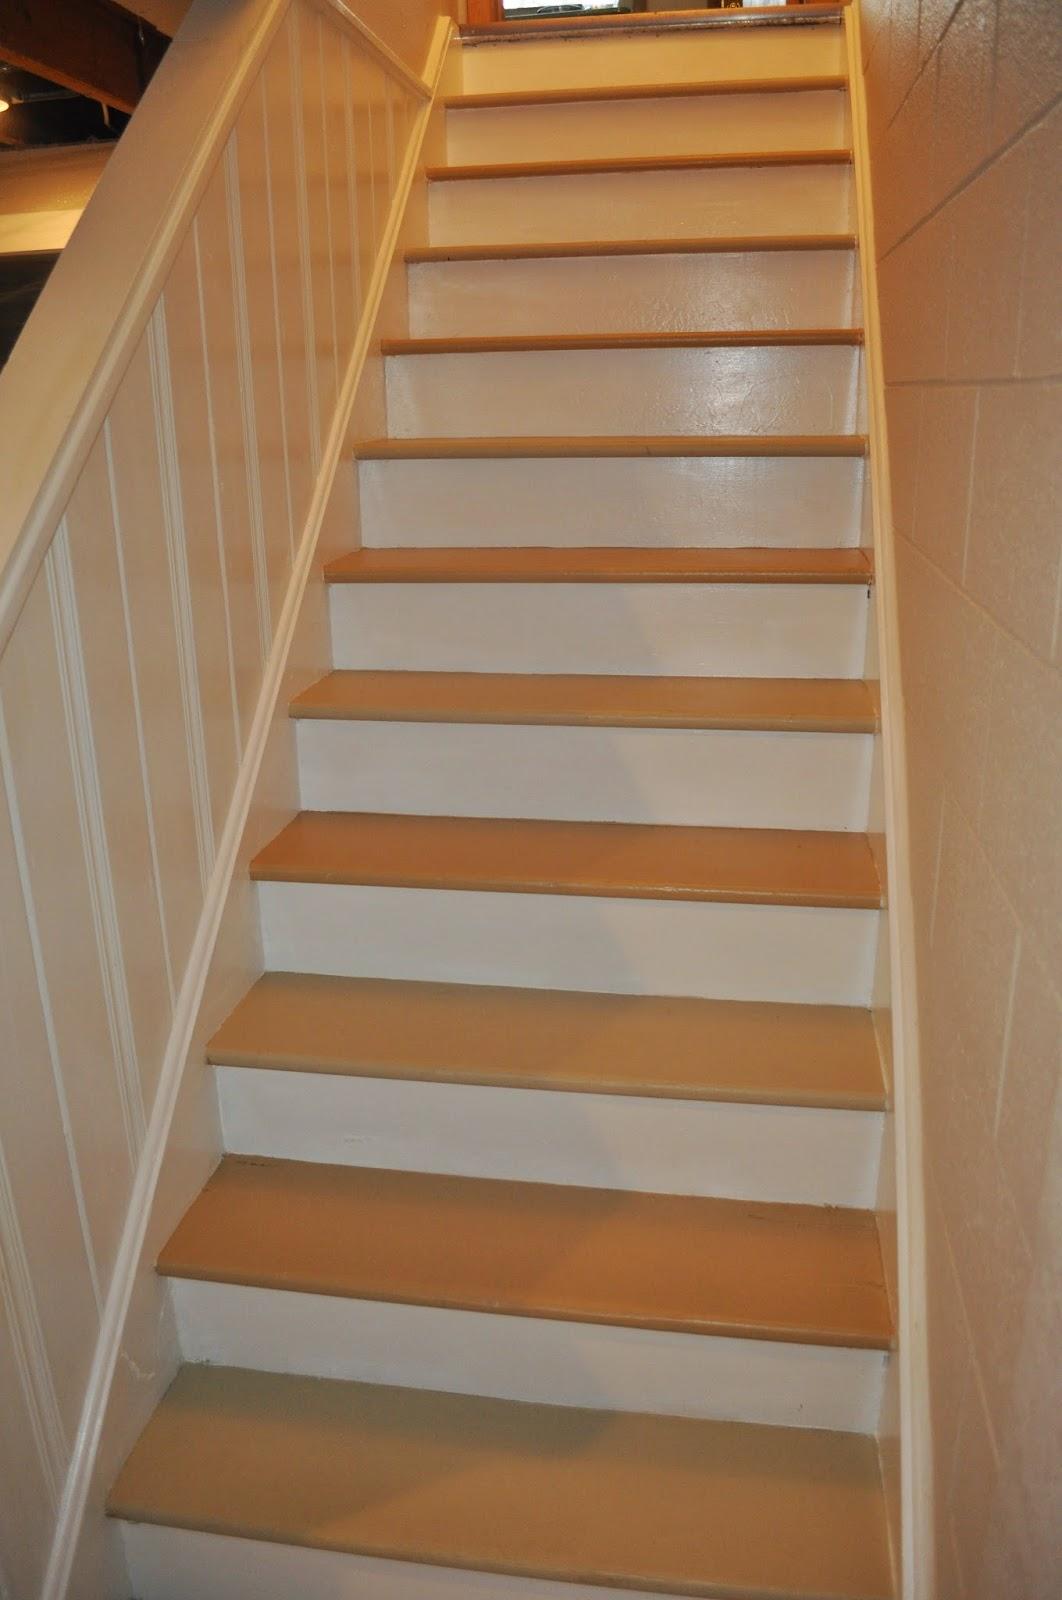 http://carriushome.blogspot.com/2015/01/basement-stairs.html